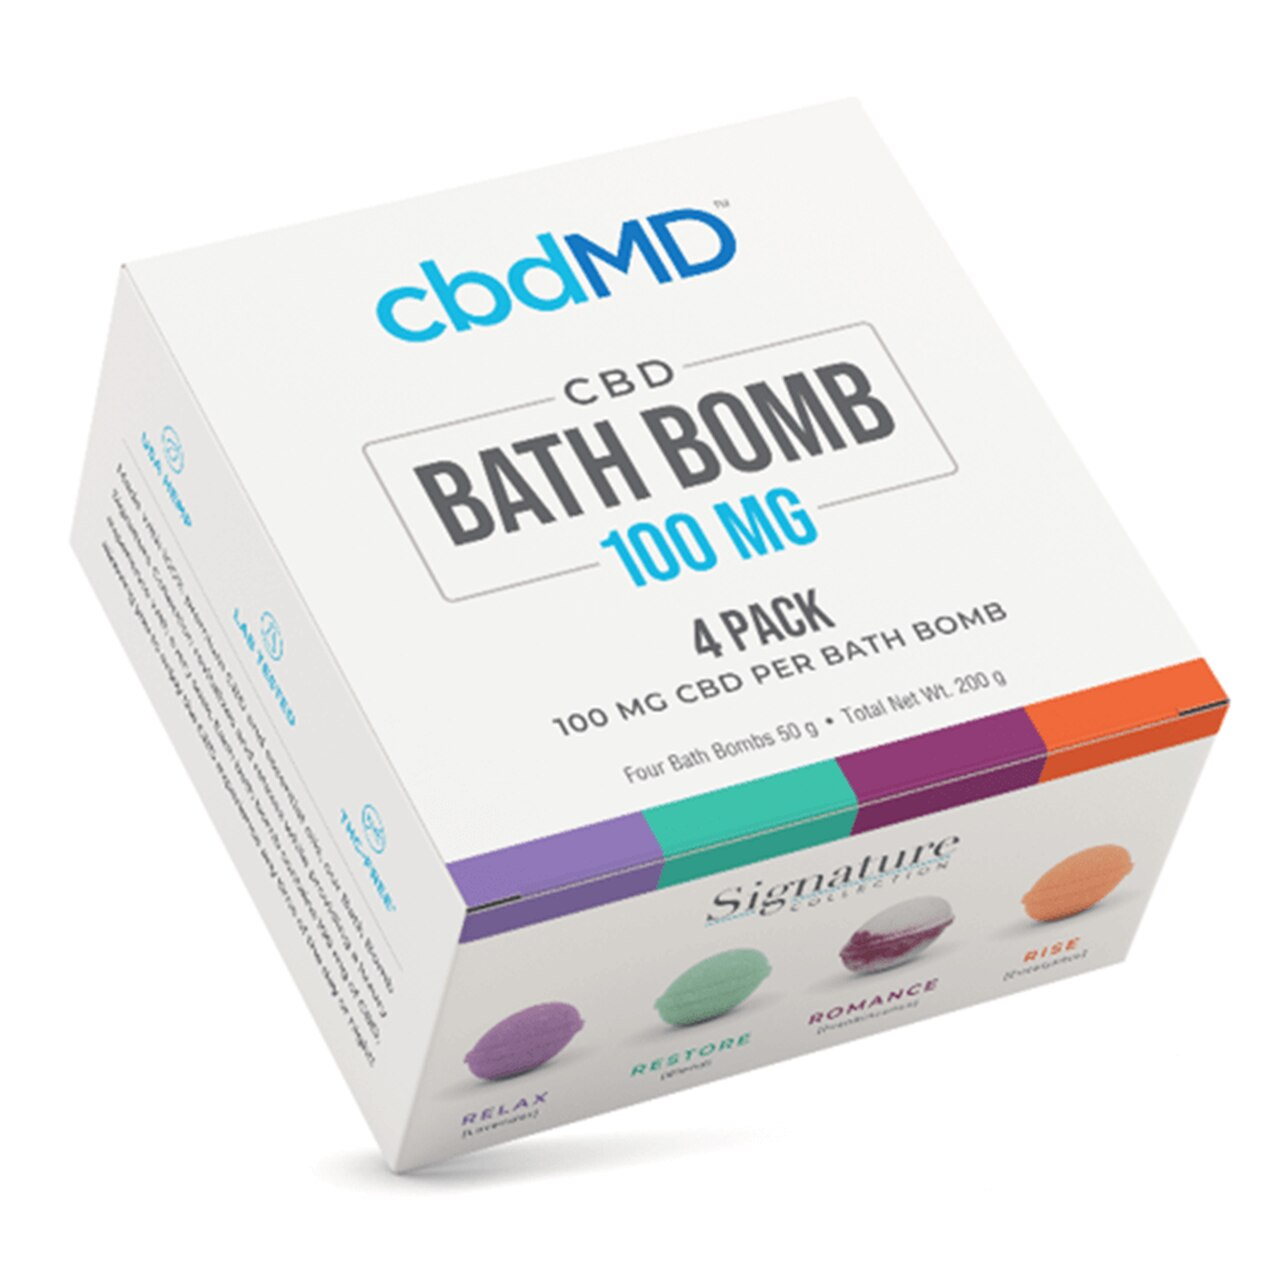 cbdMD Bath Bombs